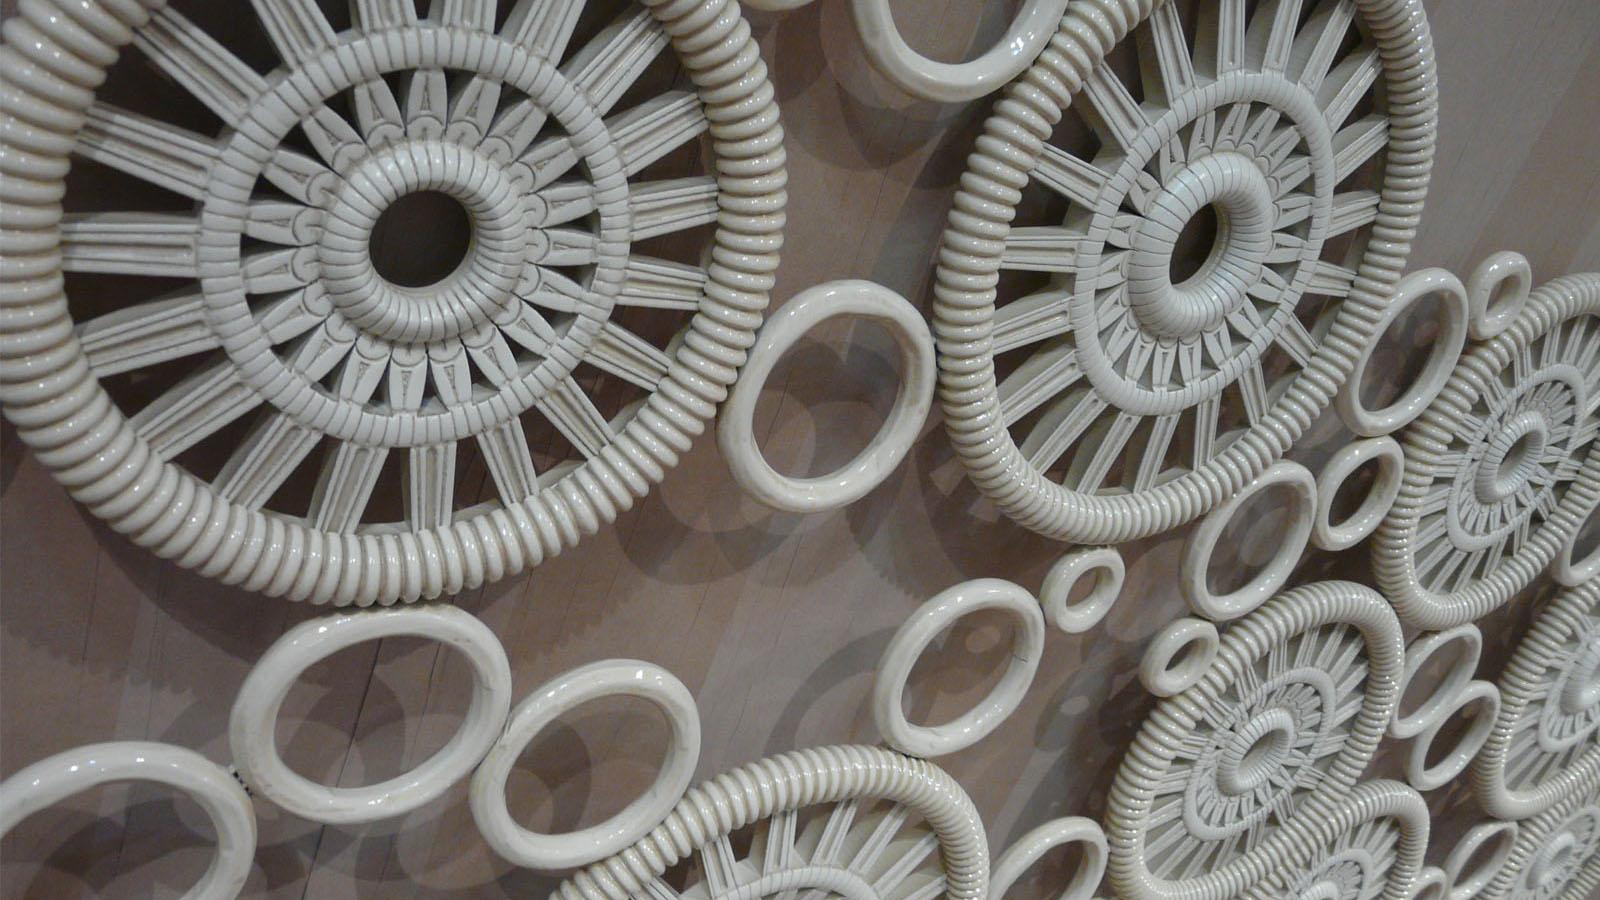 boreale-bed-collection-ciacci-ruote